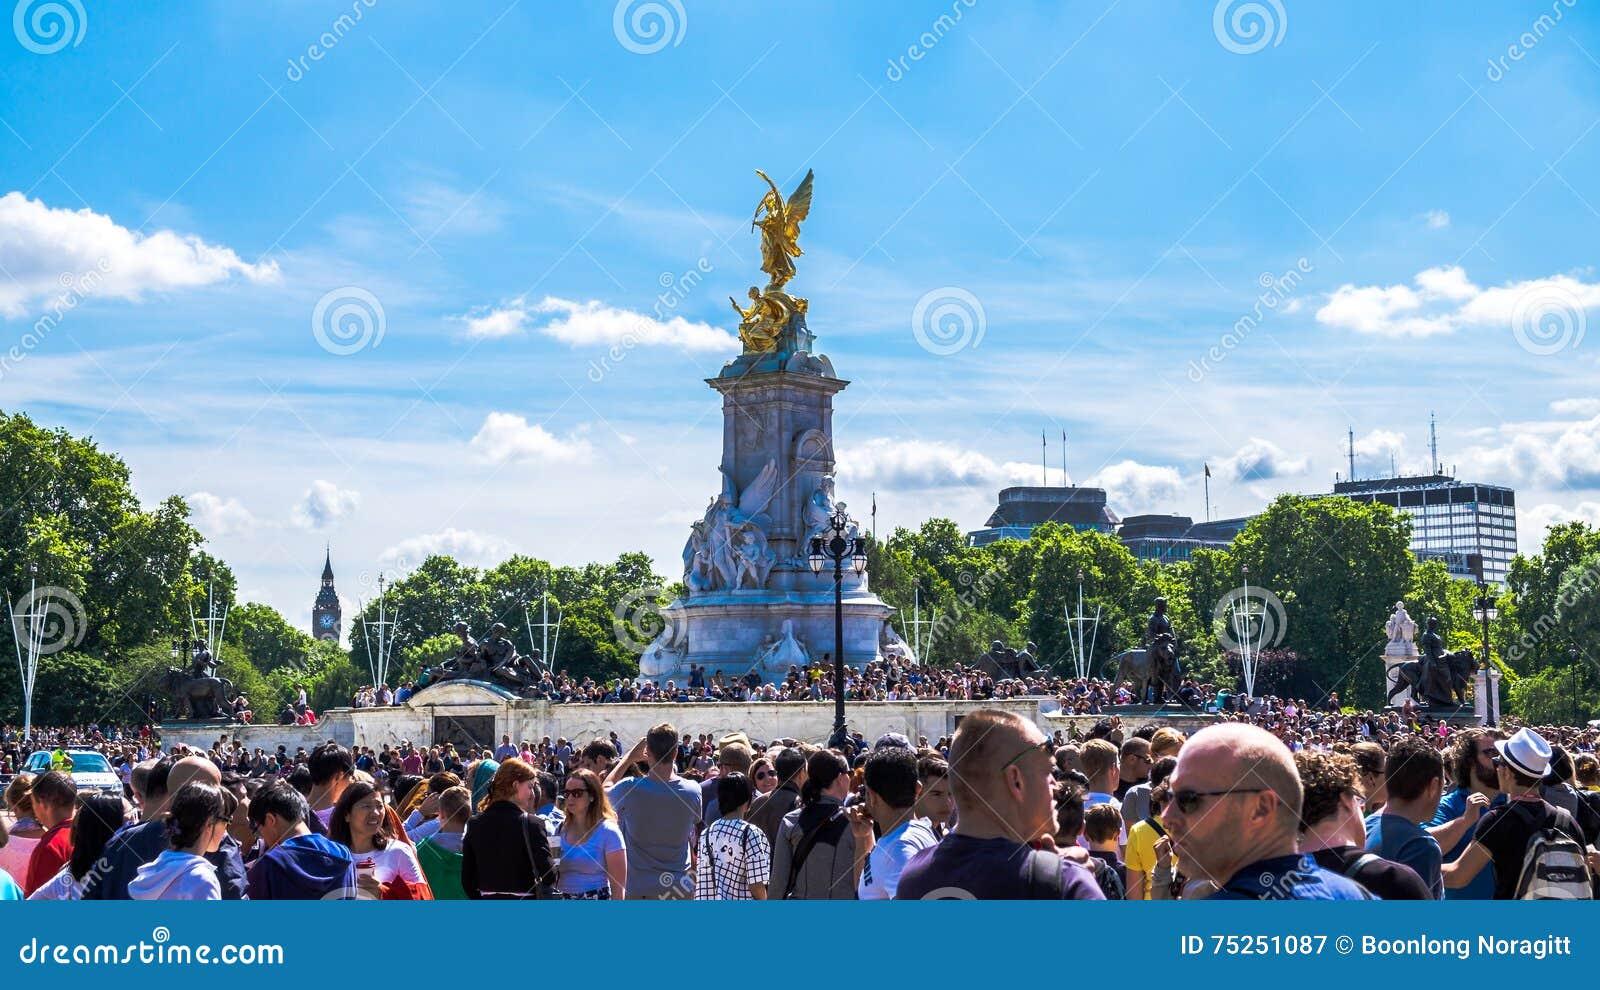 Monumento da rainha Victoria